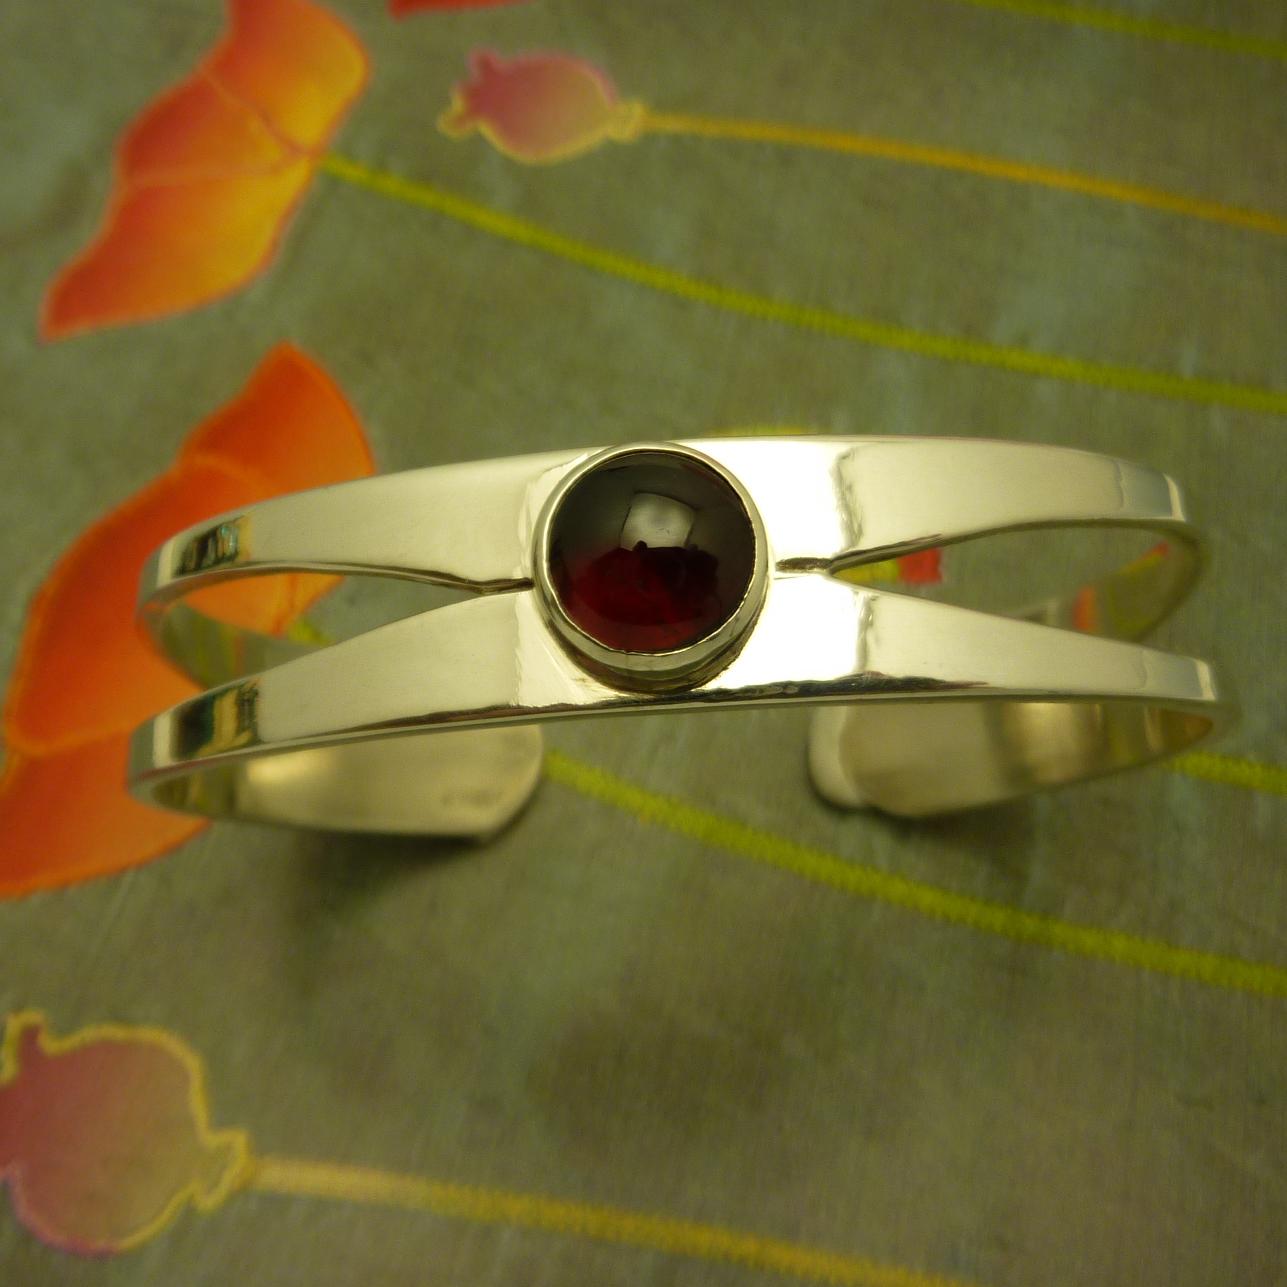 GRETCHEN- garnet cuff ss bracelet (2).JPG